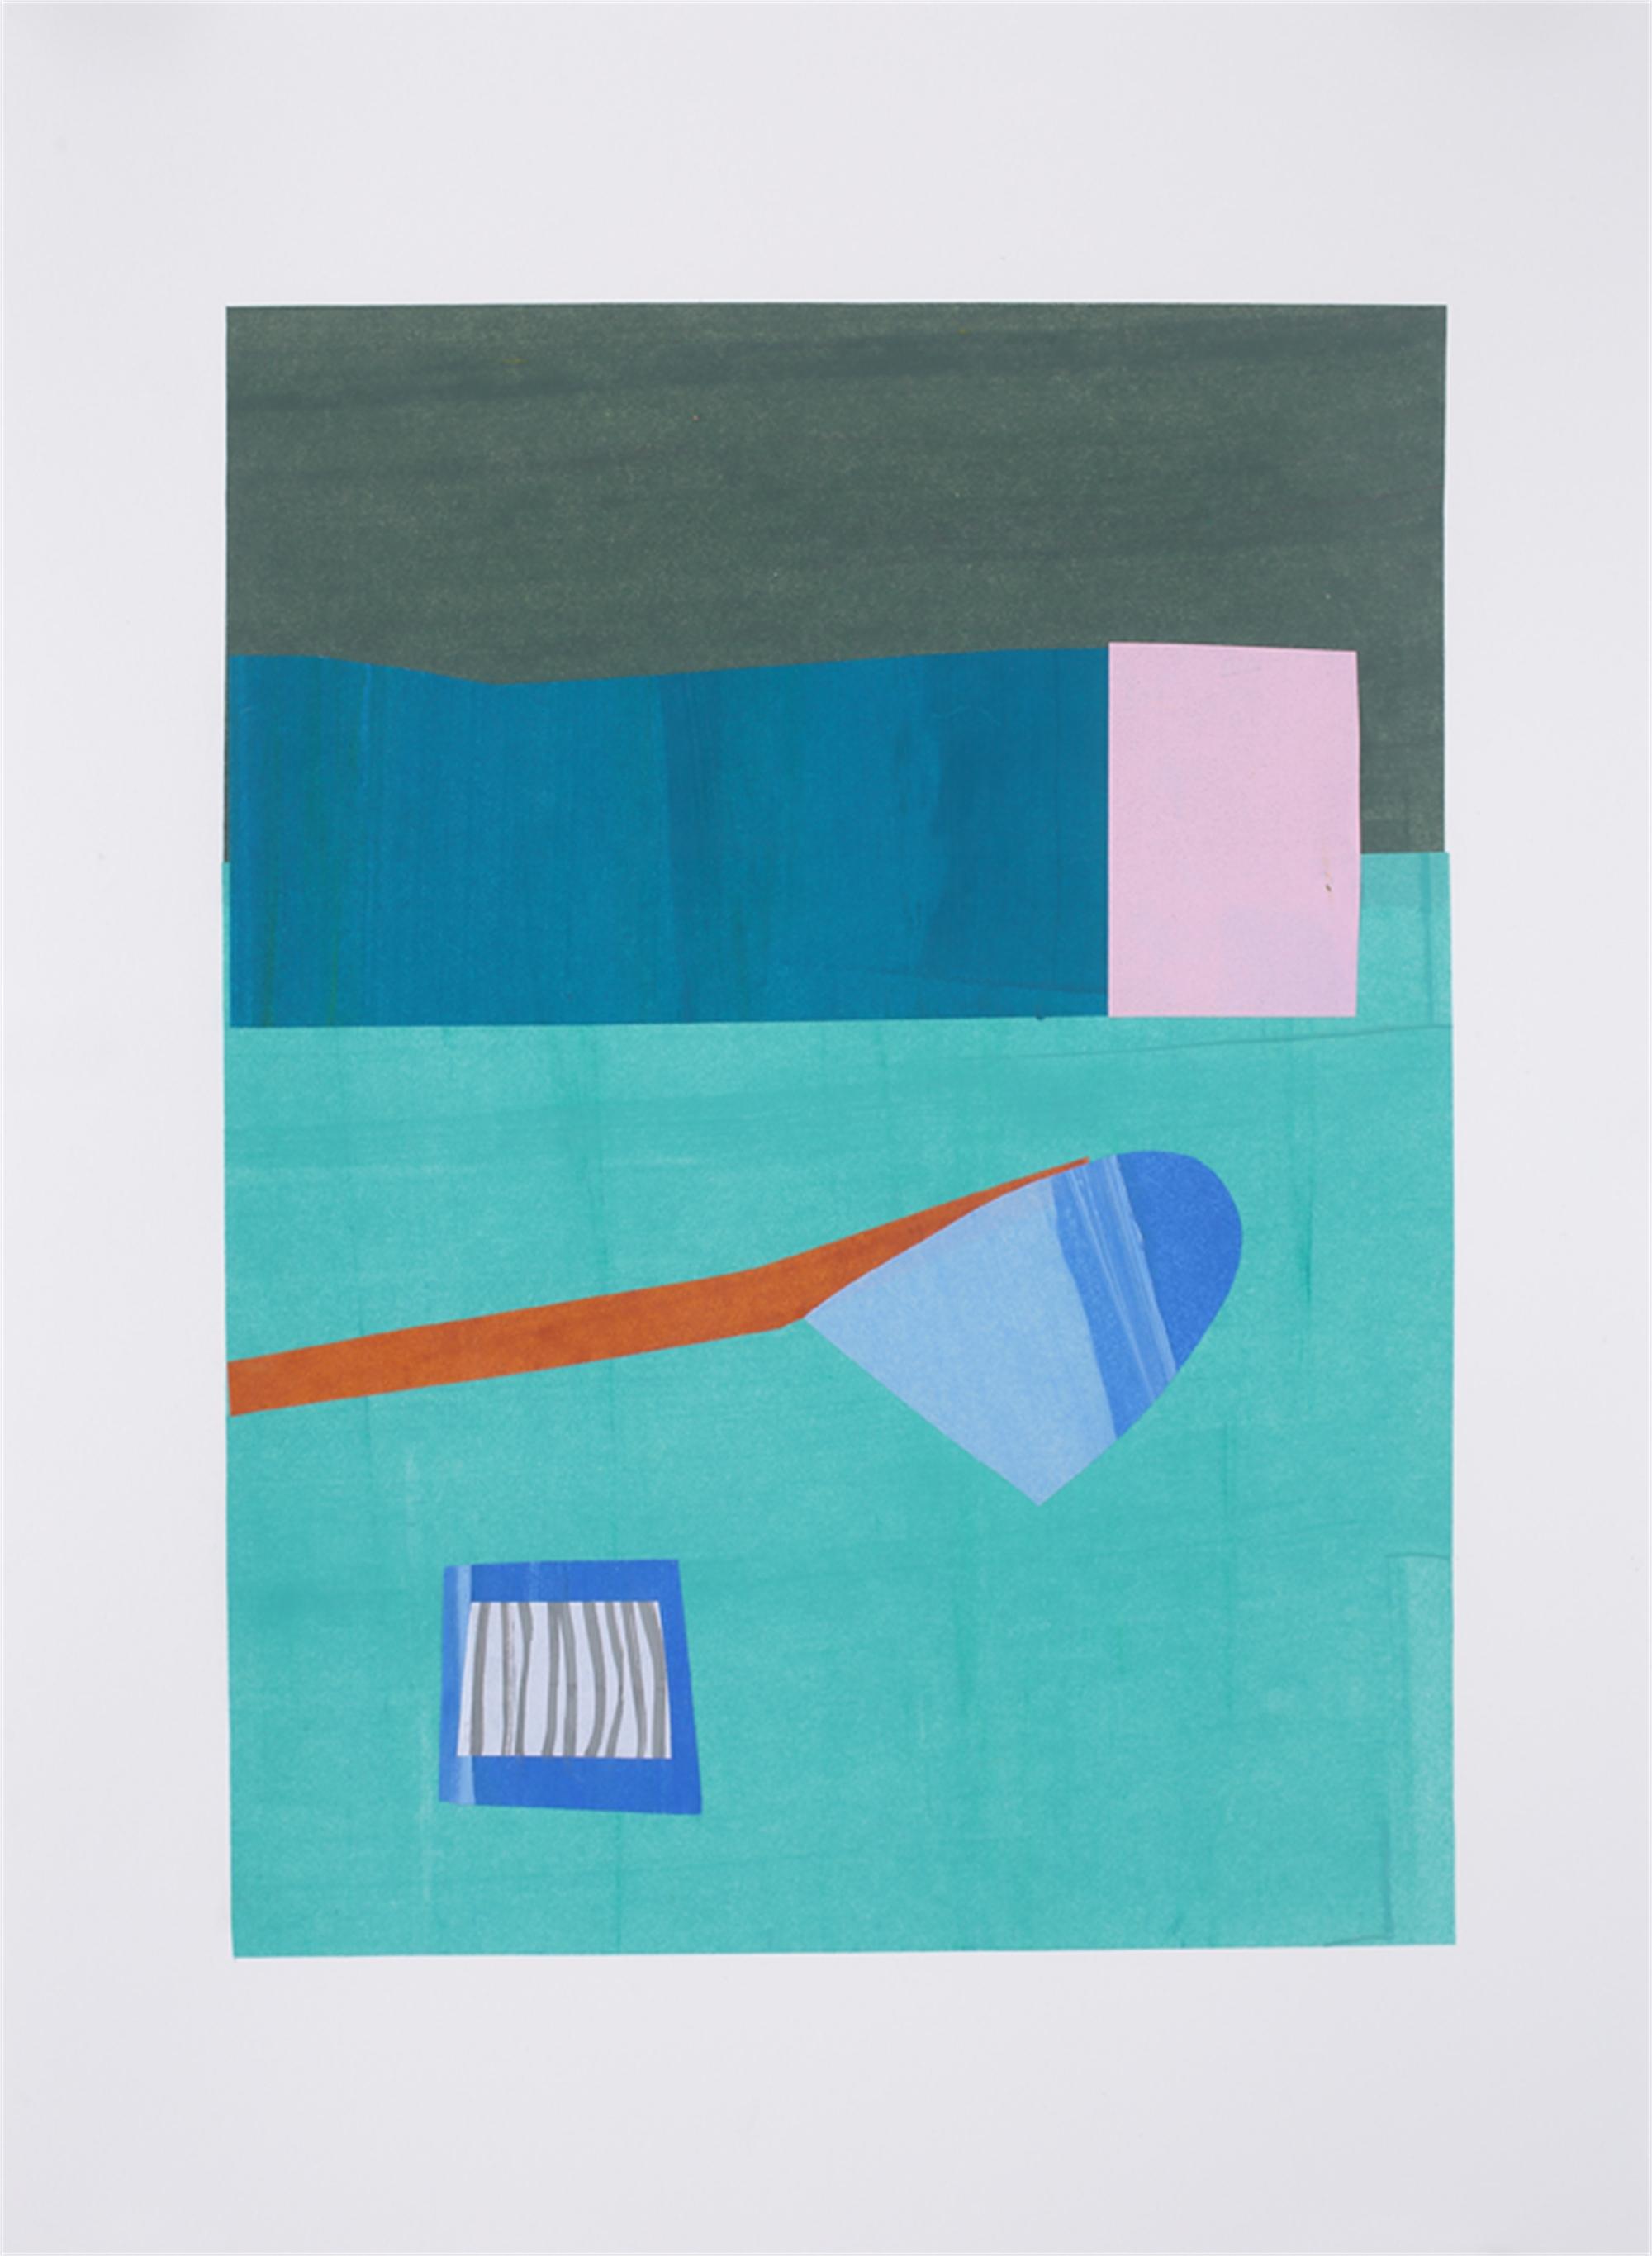 Swept Away by Lori Glavin